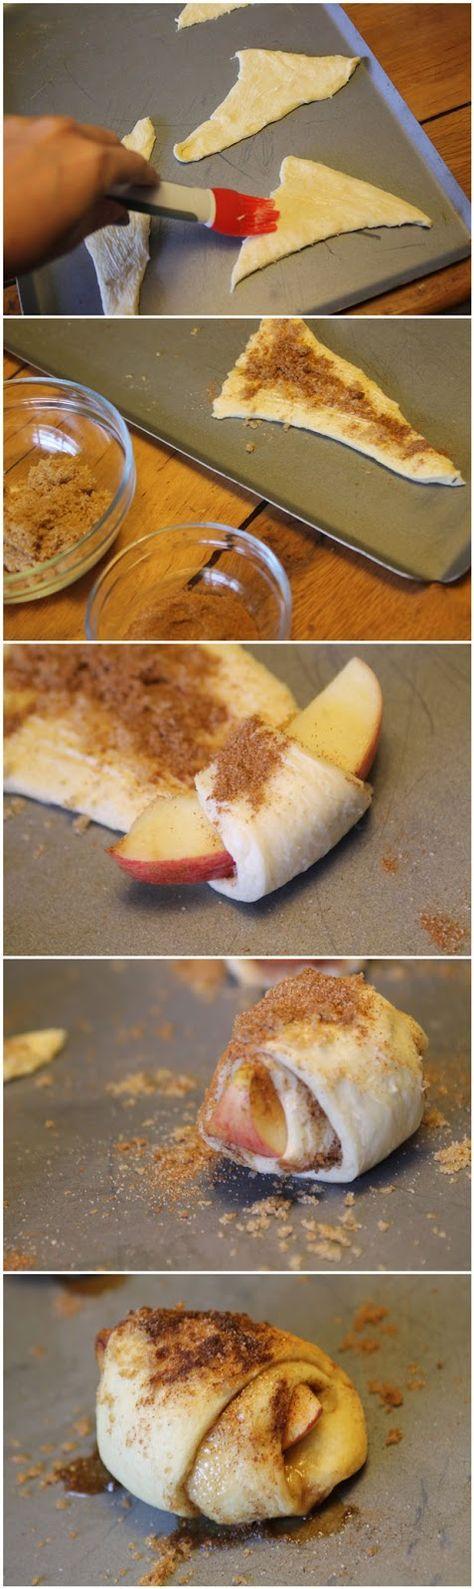 Bite Size Apple Pies..YUM